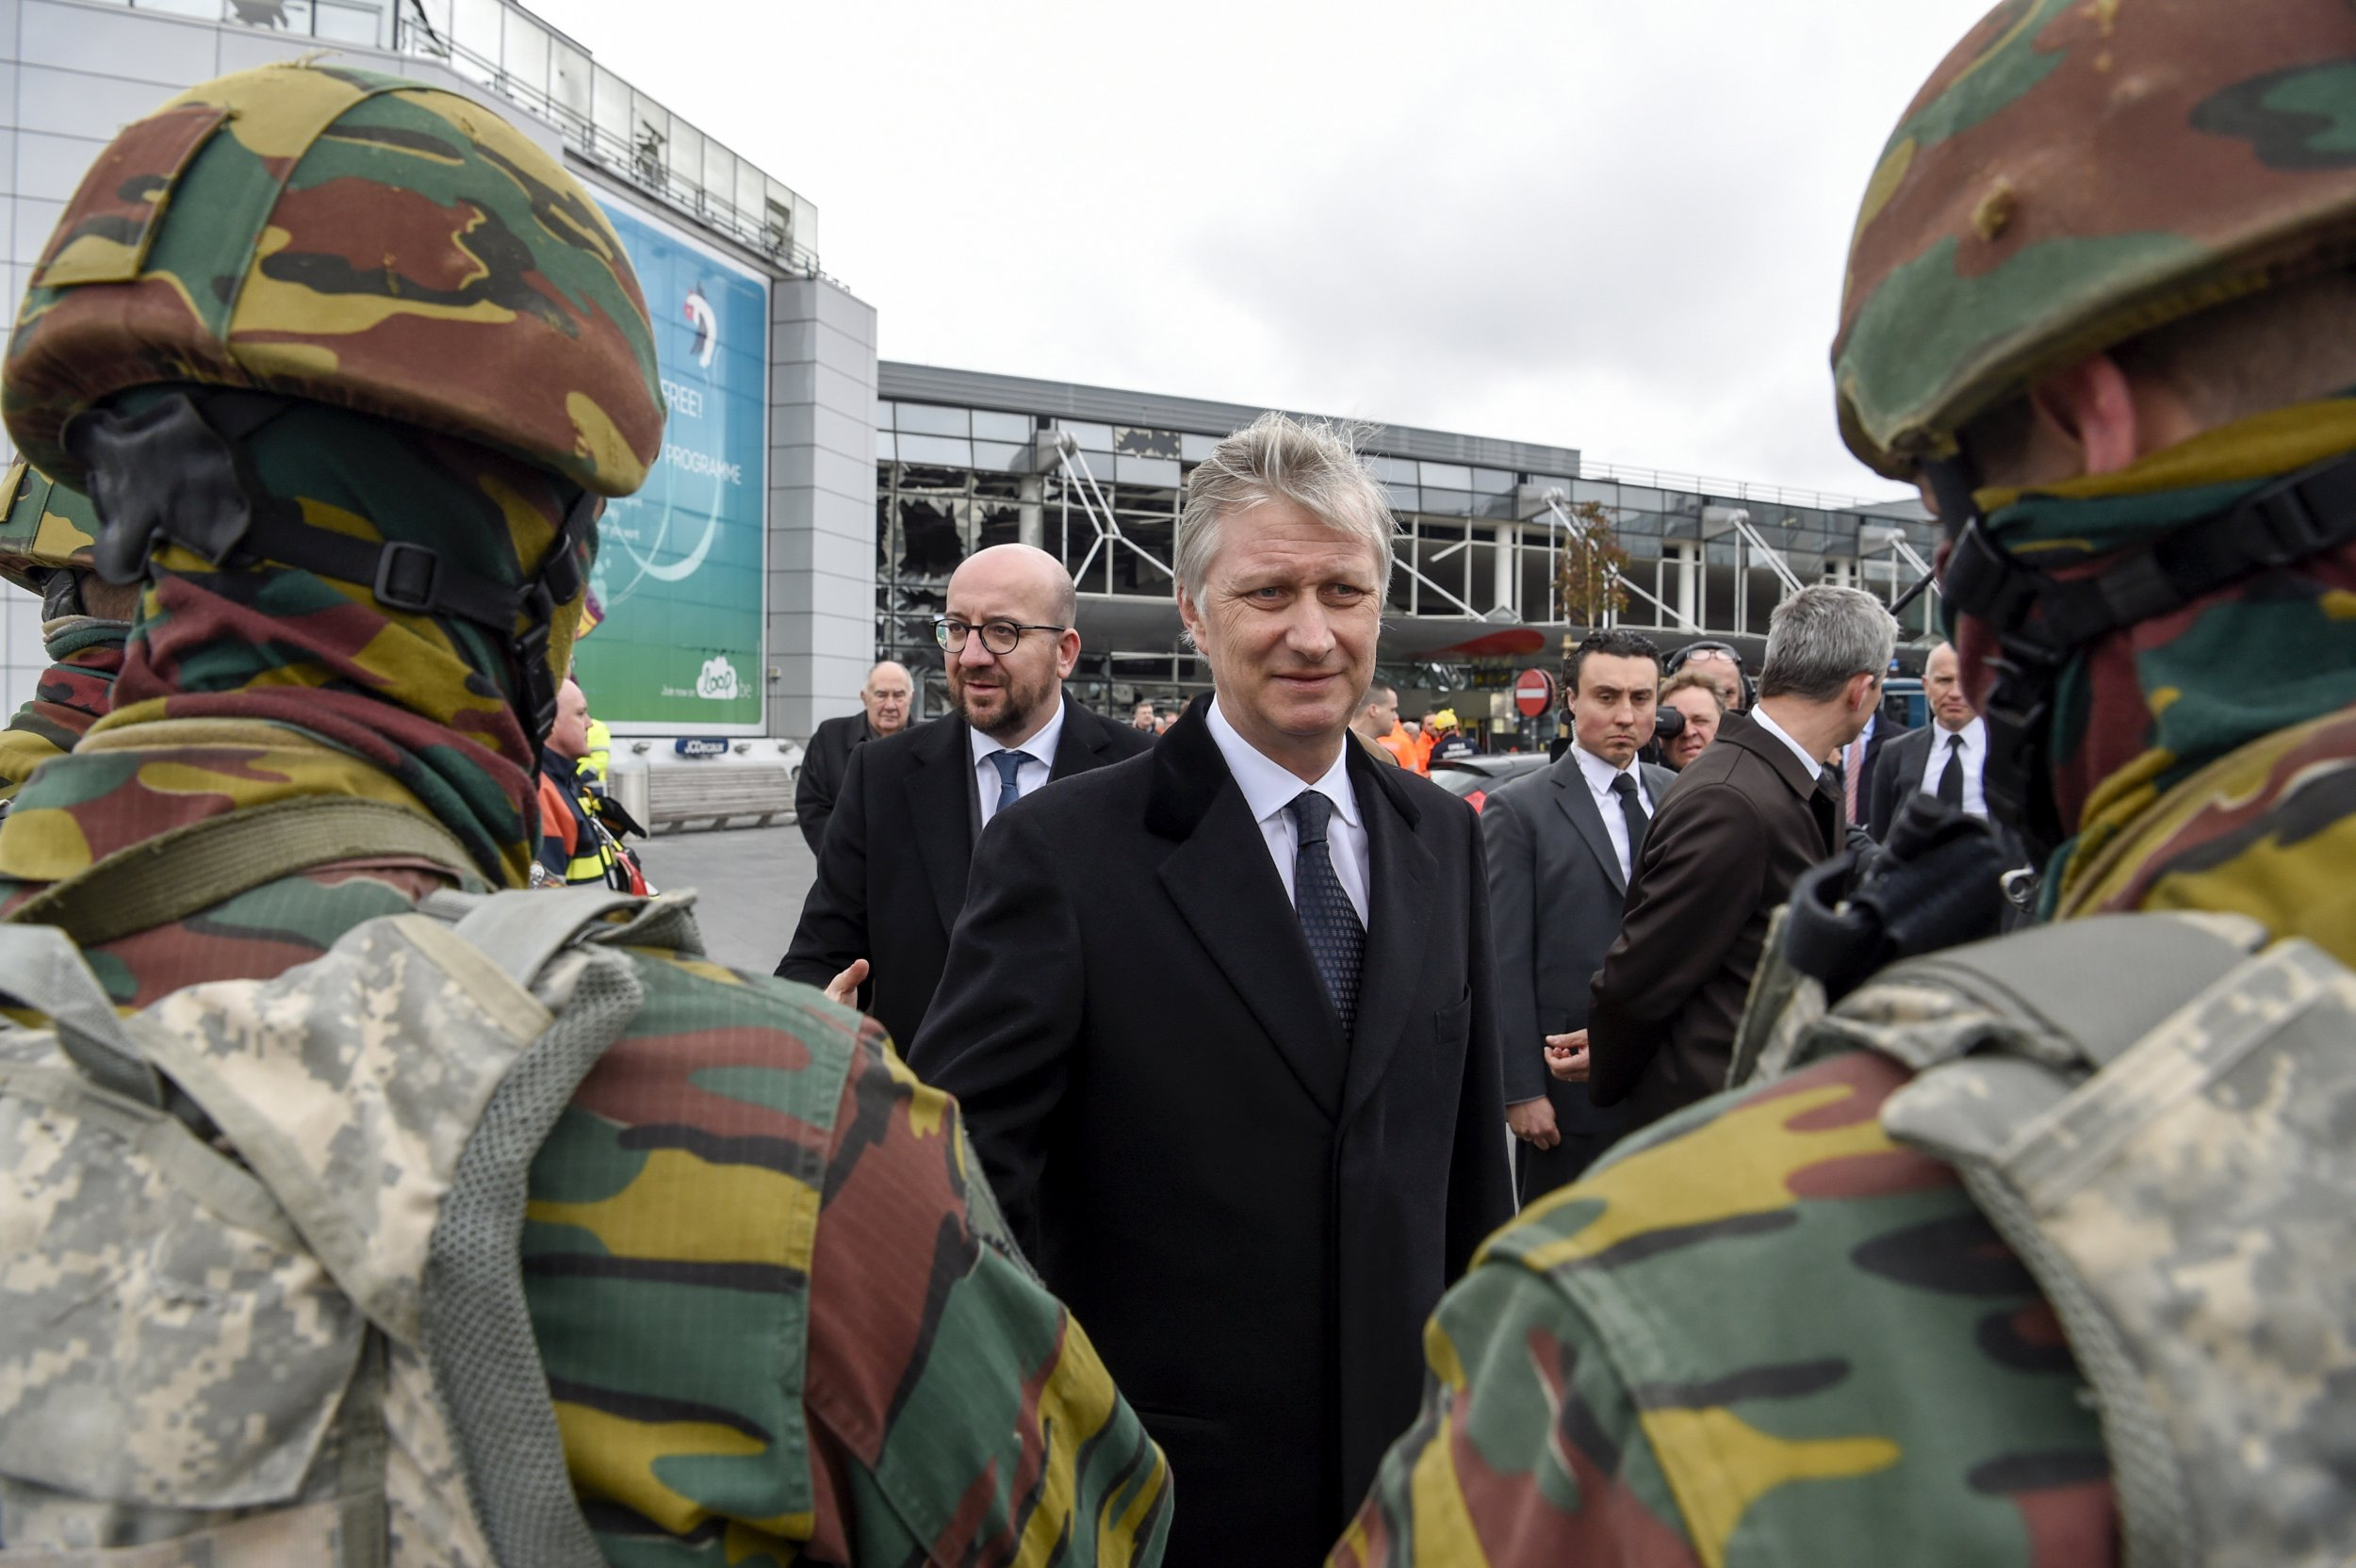 Belgium Middle East ISIS Resignations